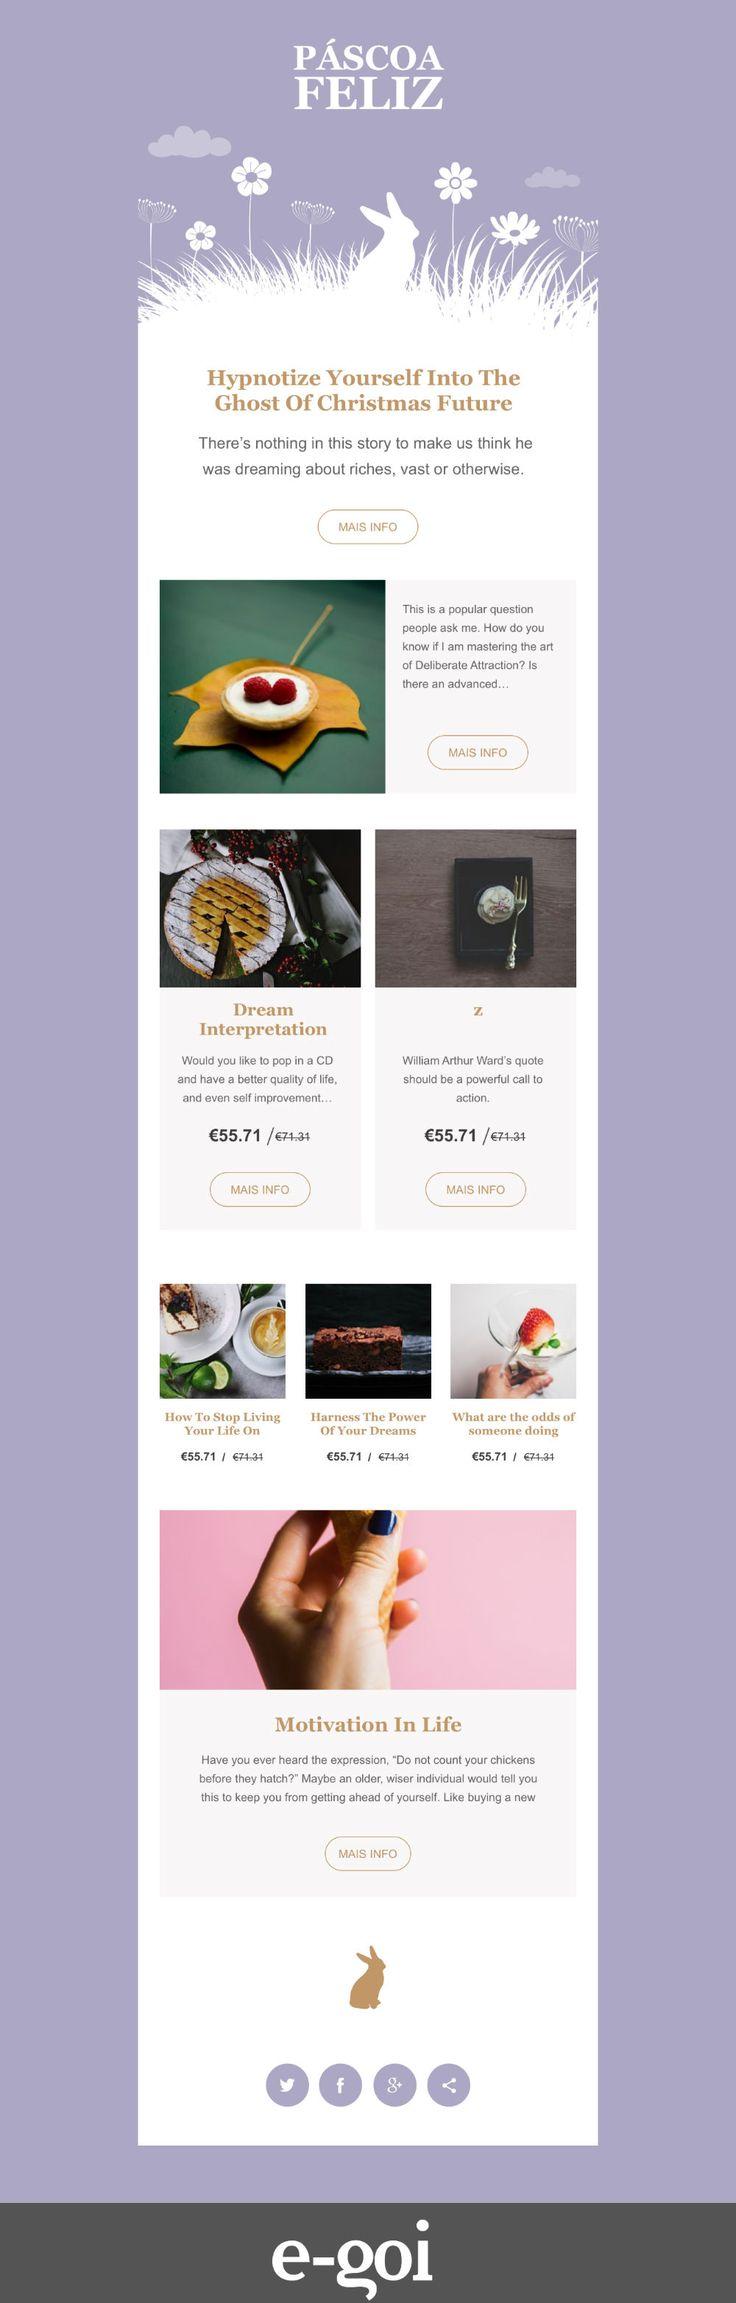 best ideas about email newsletter templates template de email marketing gratuito simples e profissional template de newsletter para paacutescoa 2017